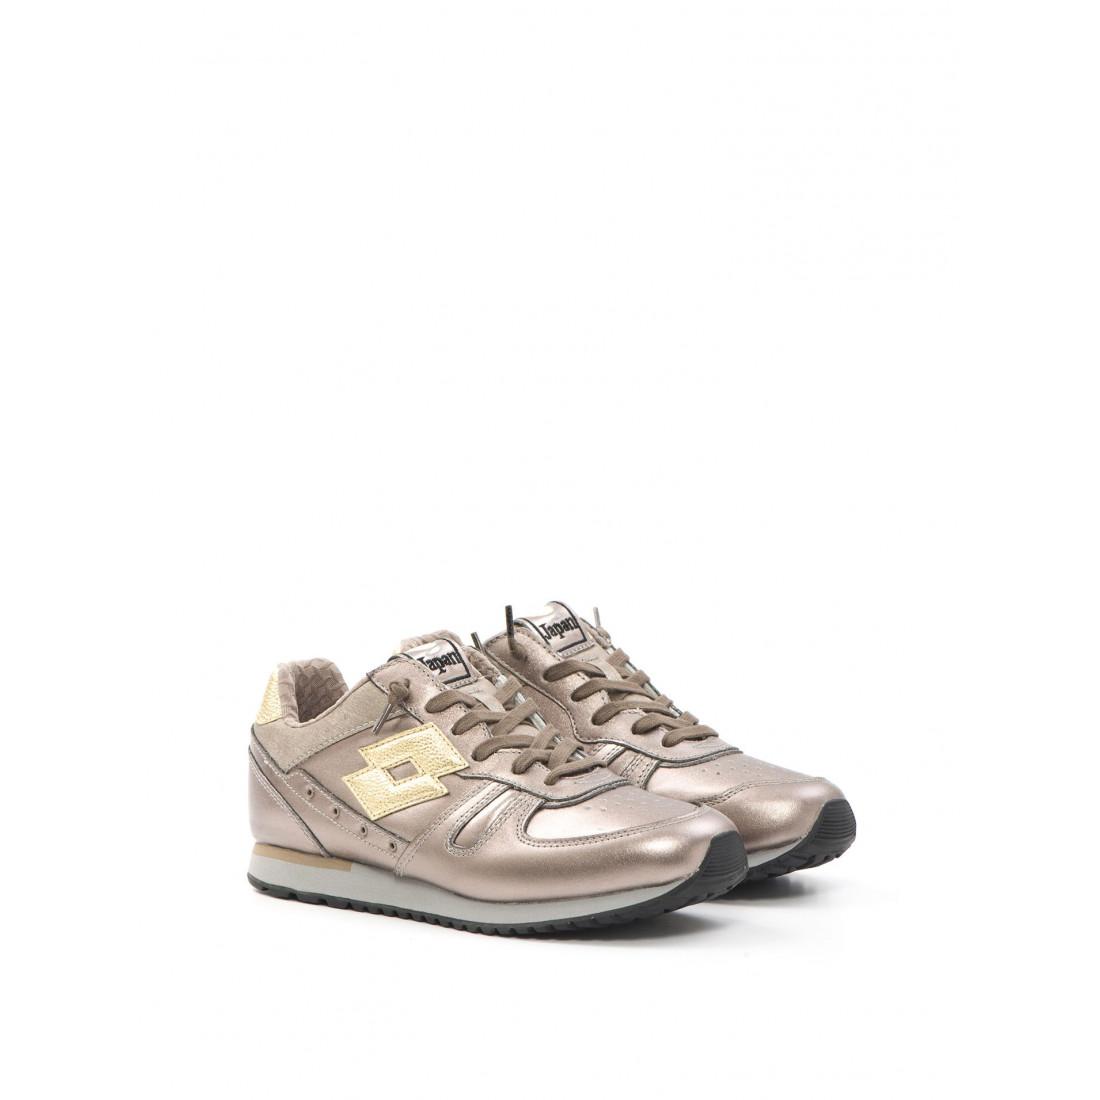 f4b9572812 Sneakers Lotto Leggenda TOKYO SHIBUYA oro